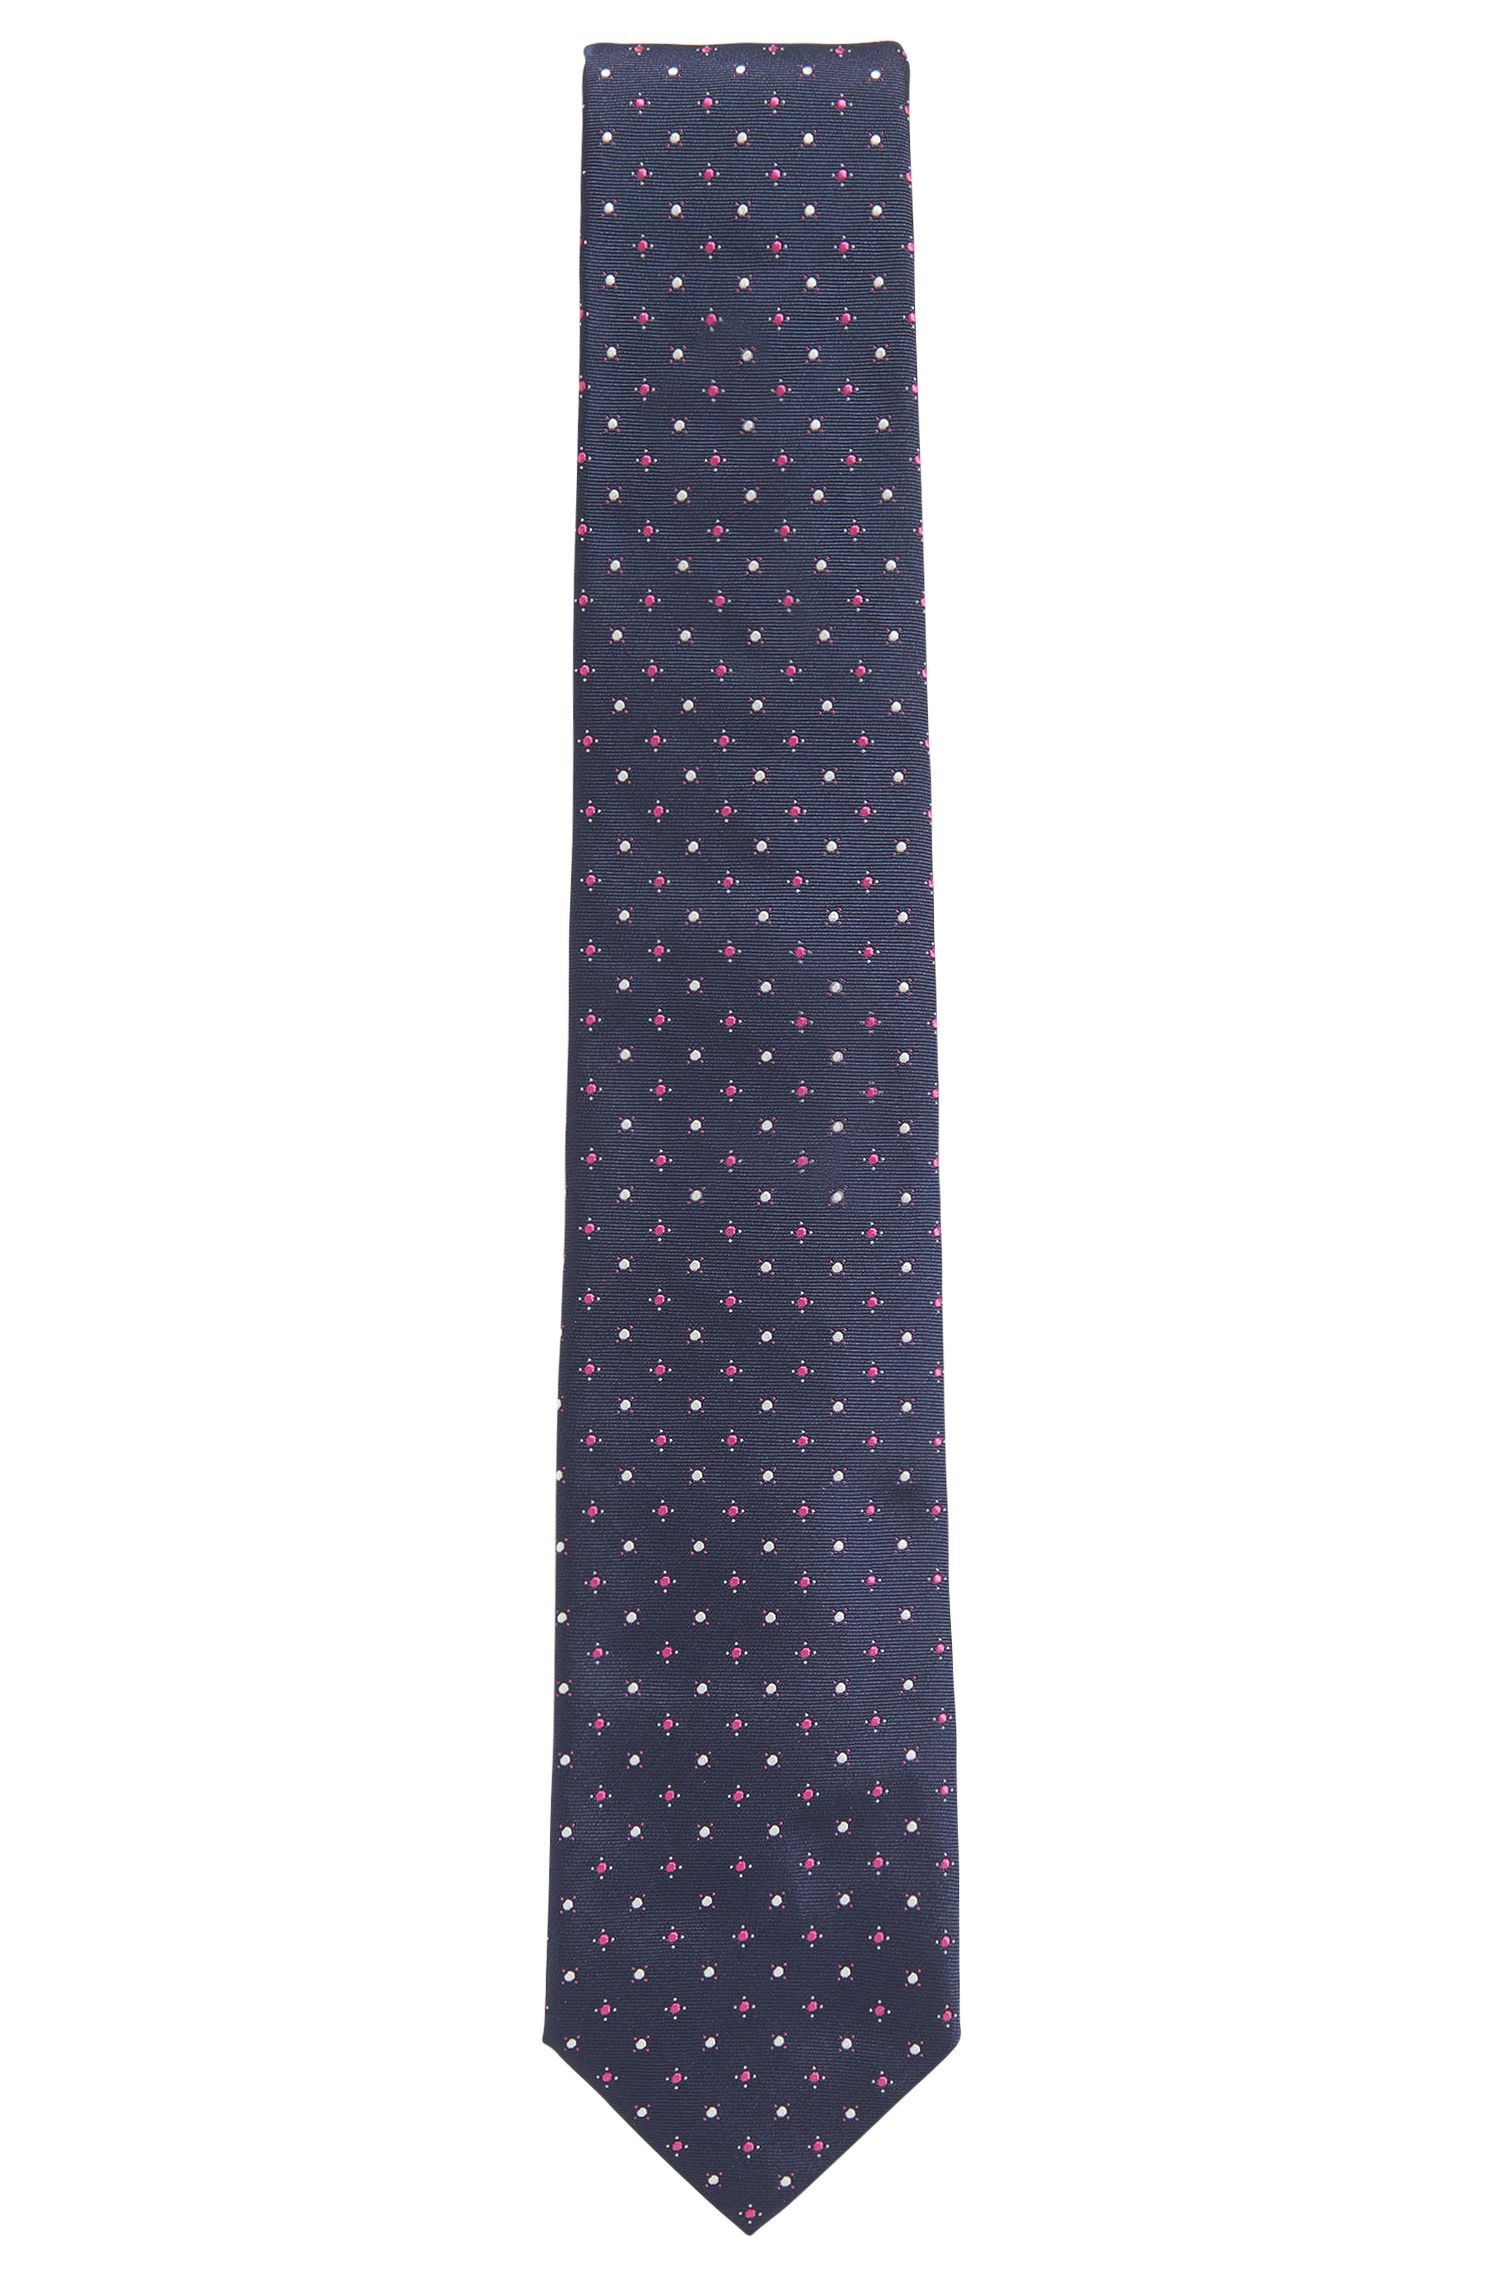 Dot Embroidered Italian Silk Tie